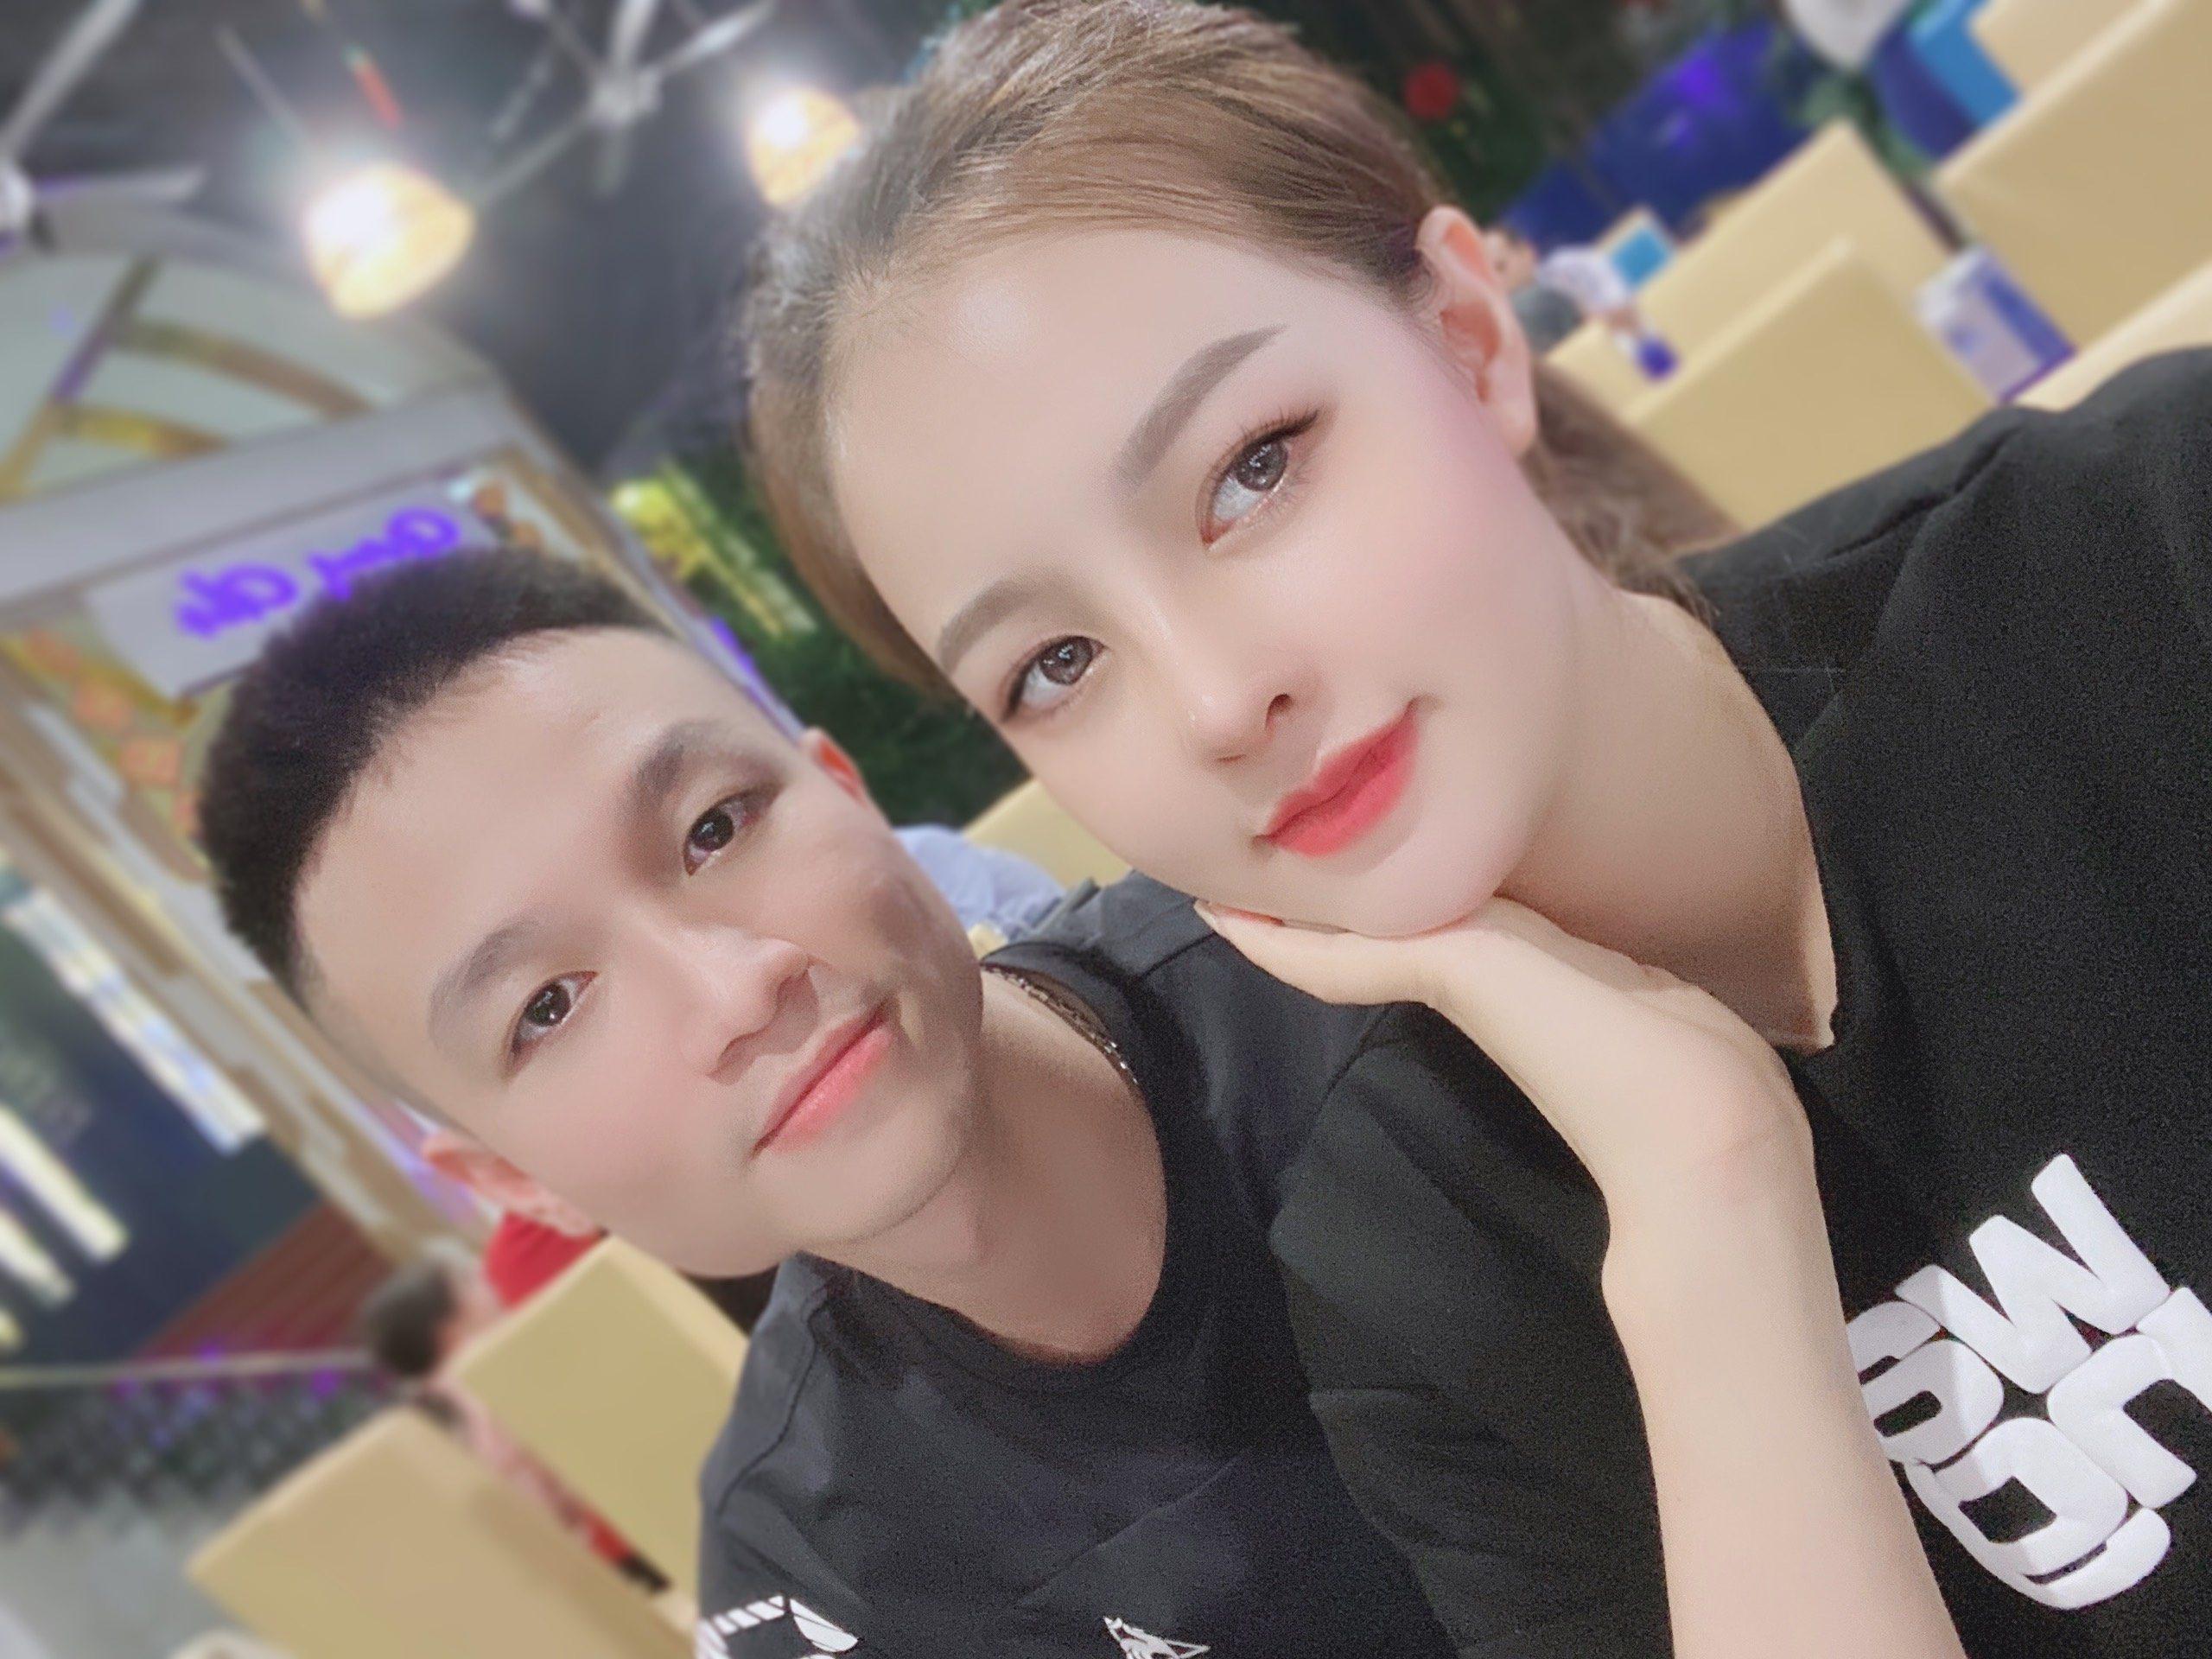 Truong Thi Chinh